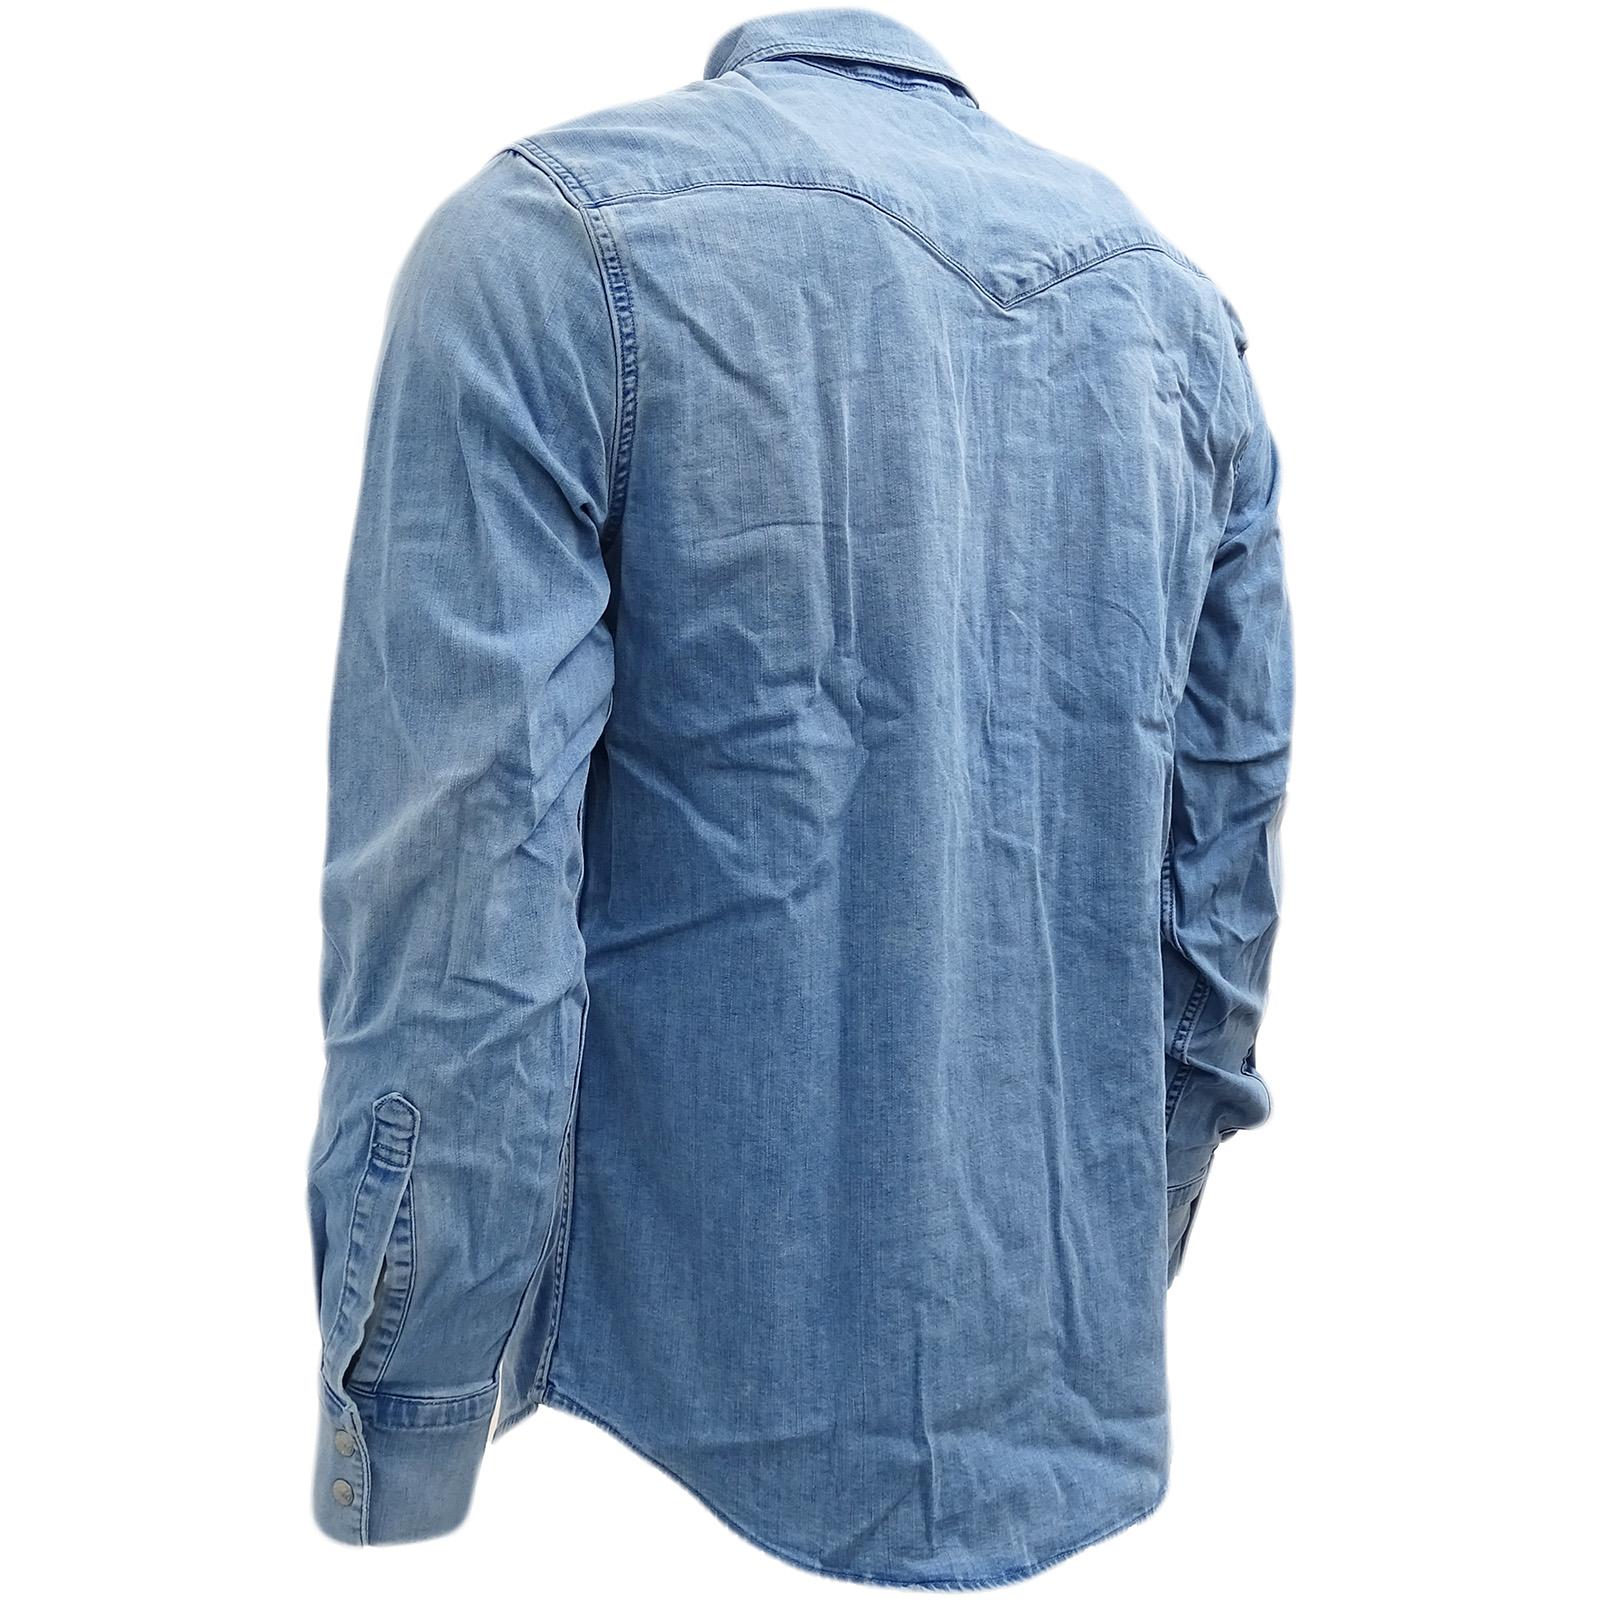 Camicia Barstow Levi Con 65816 Chiaro 0253 Occidentale Strauss Stretch Blu n75wr5Yq